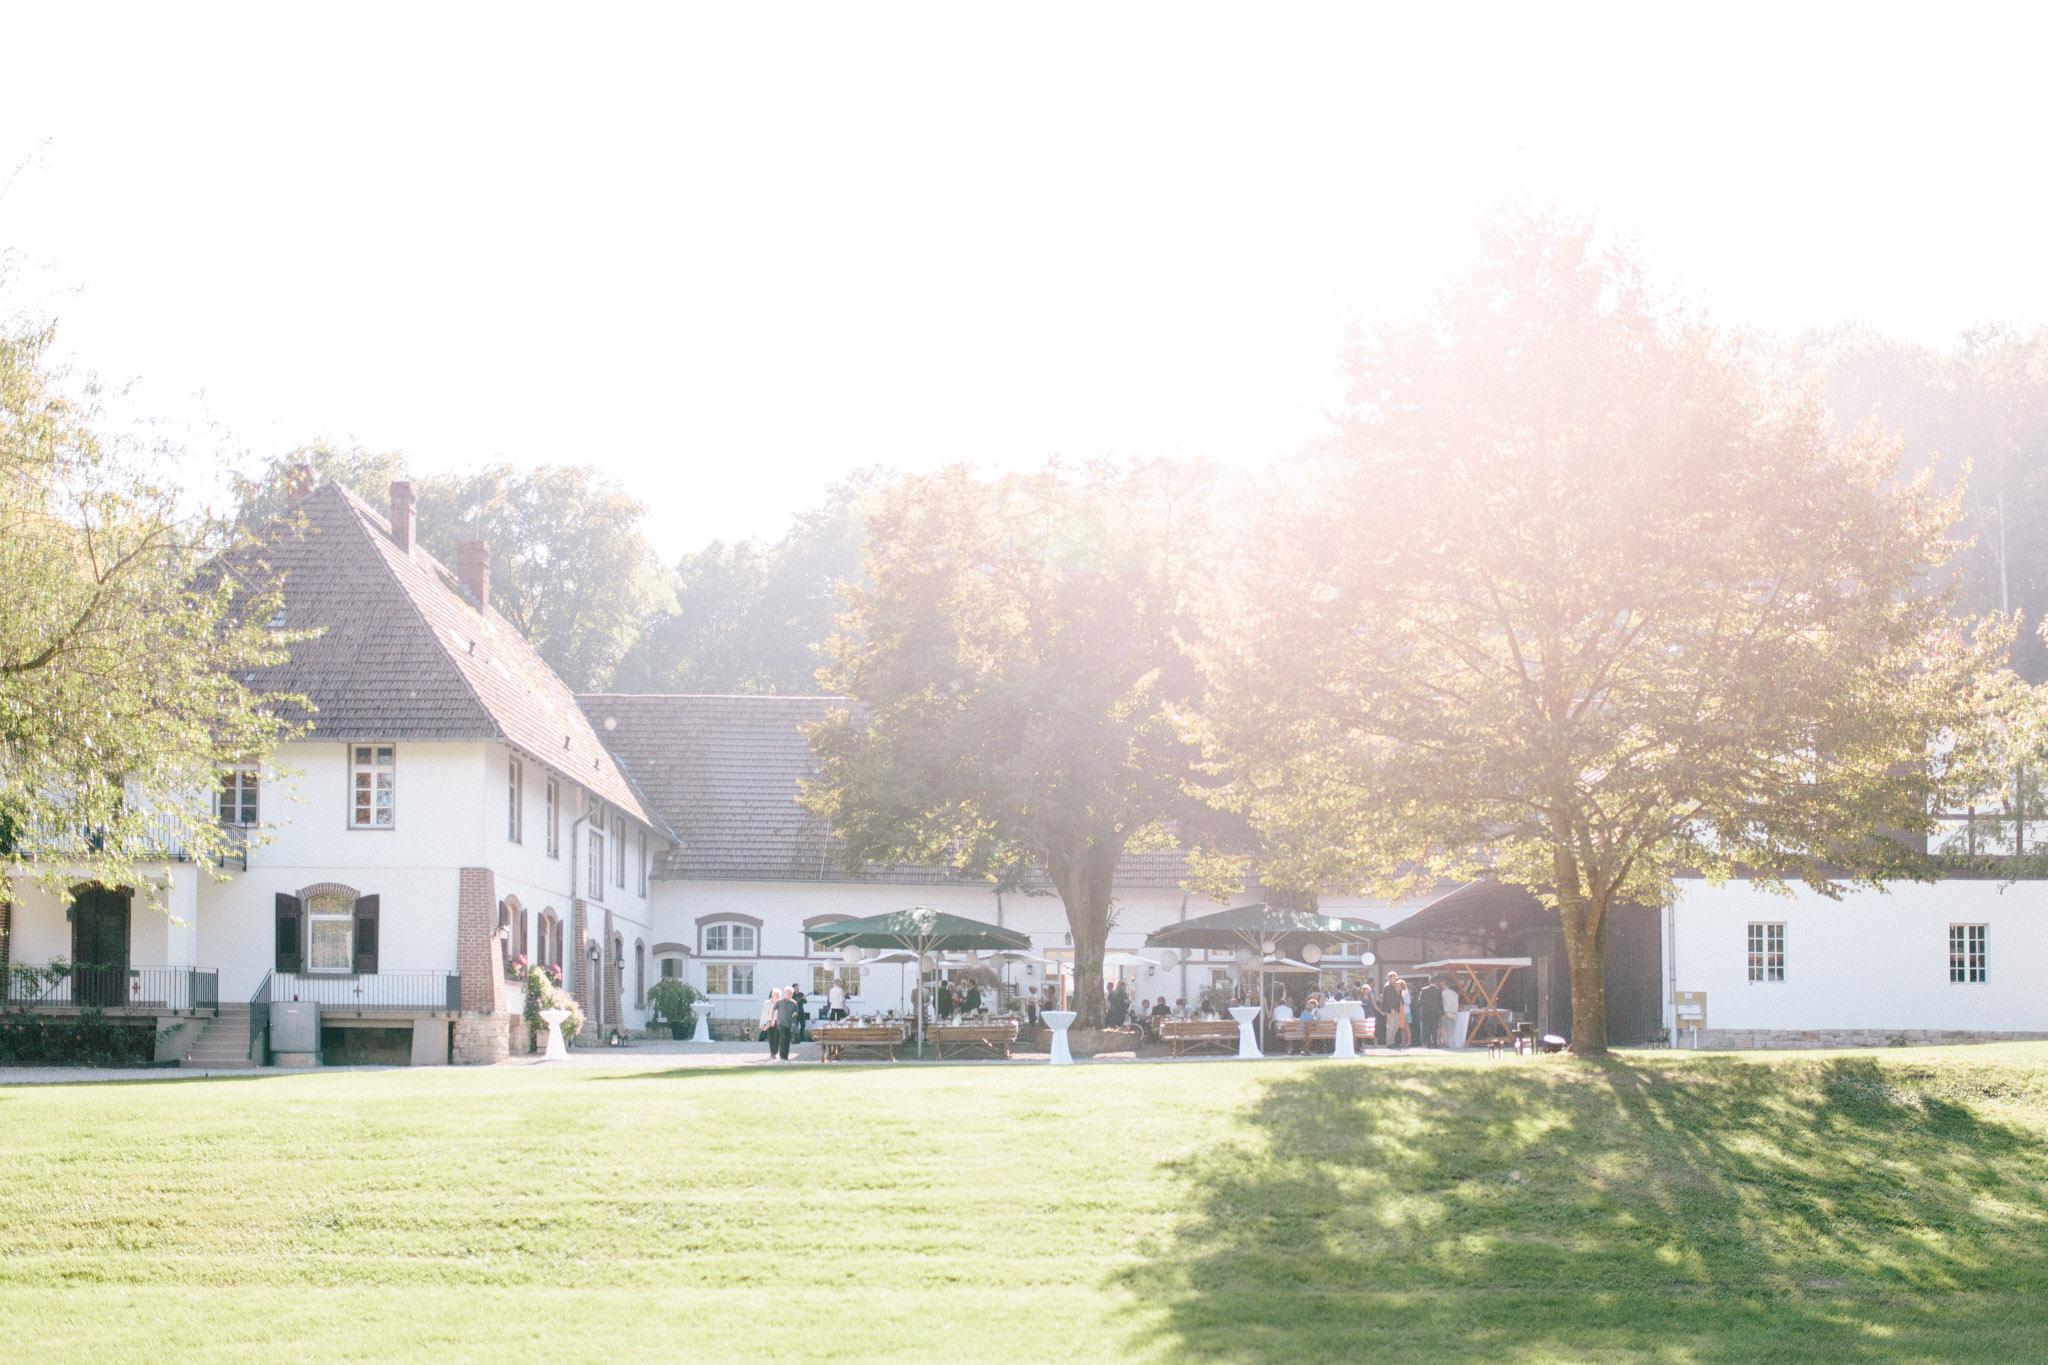 Lilienhof-Freiburg-Hochzeit-Pia-Anna-Christian-Wedding-Photography-FS-67.jpg